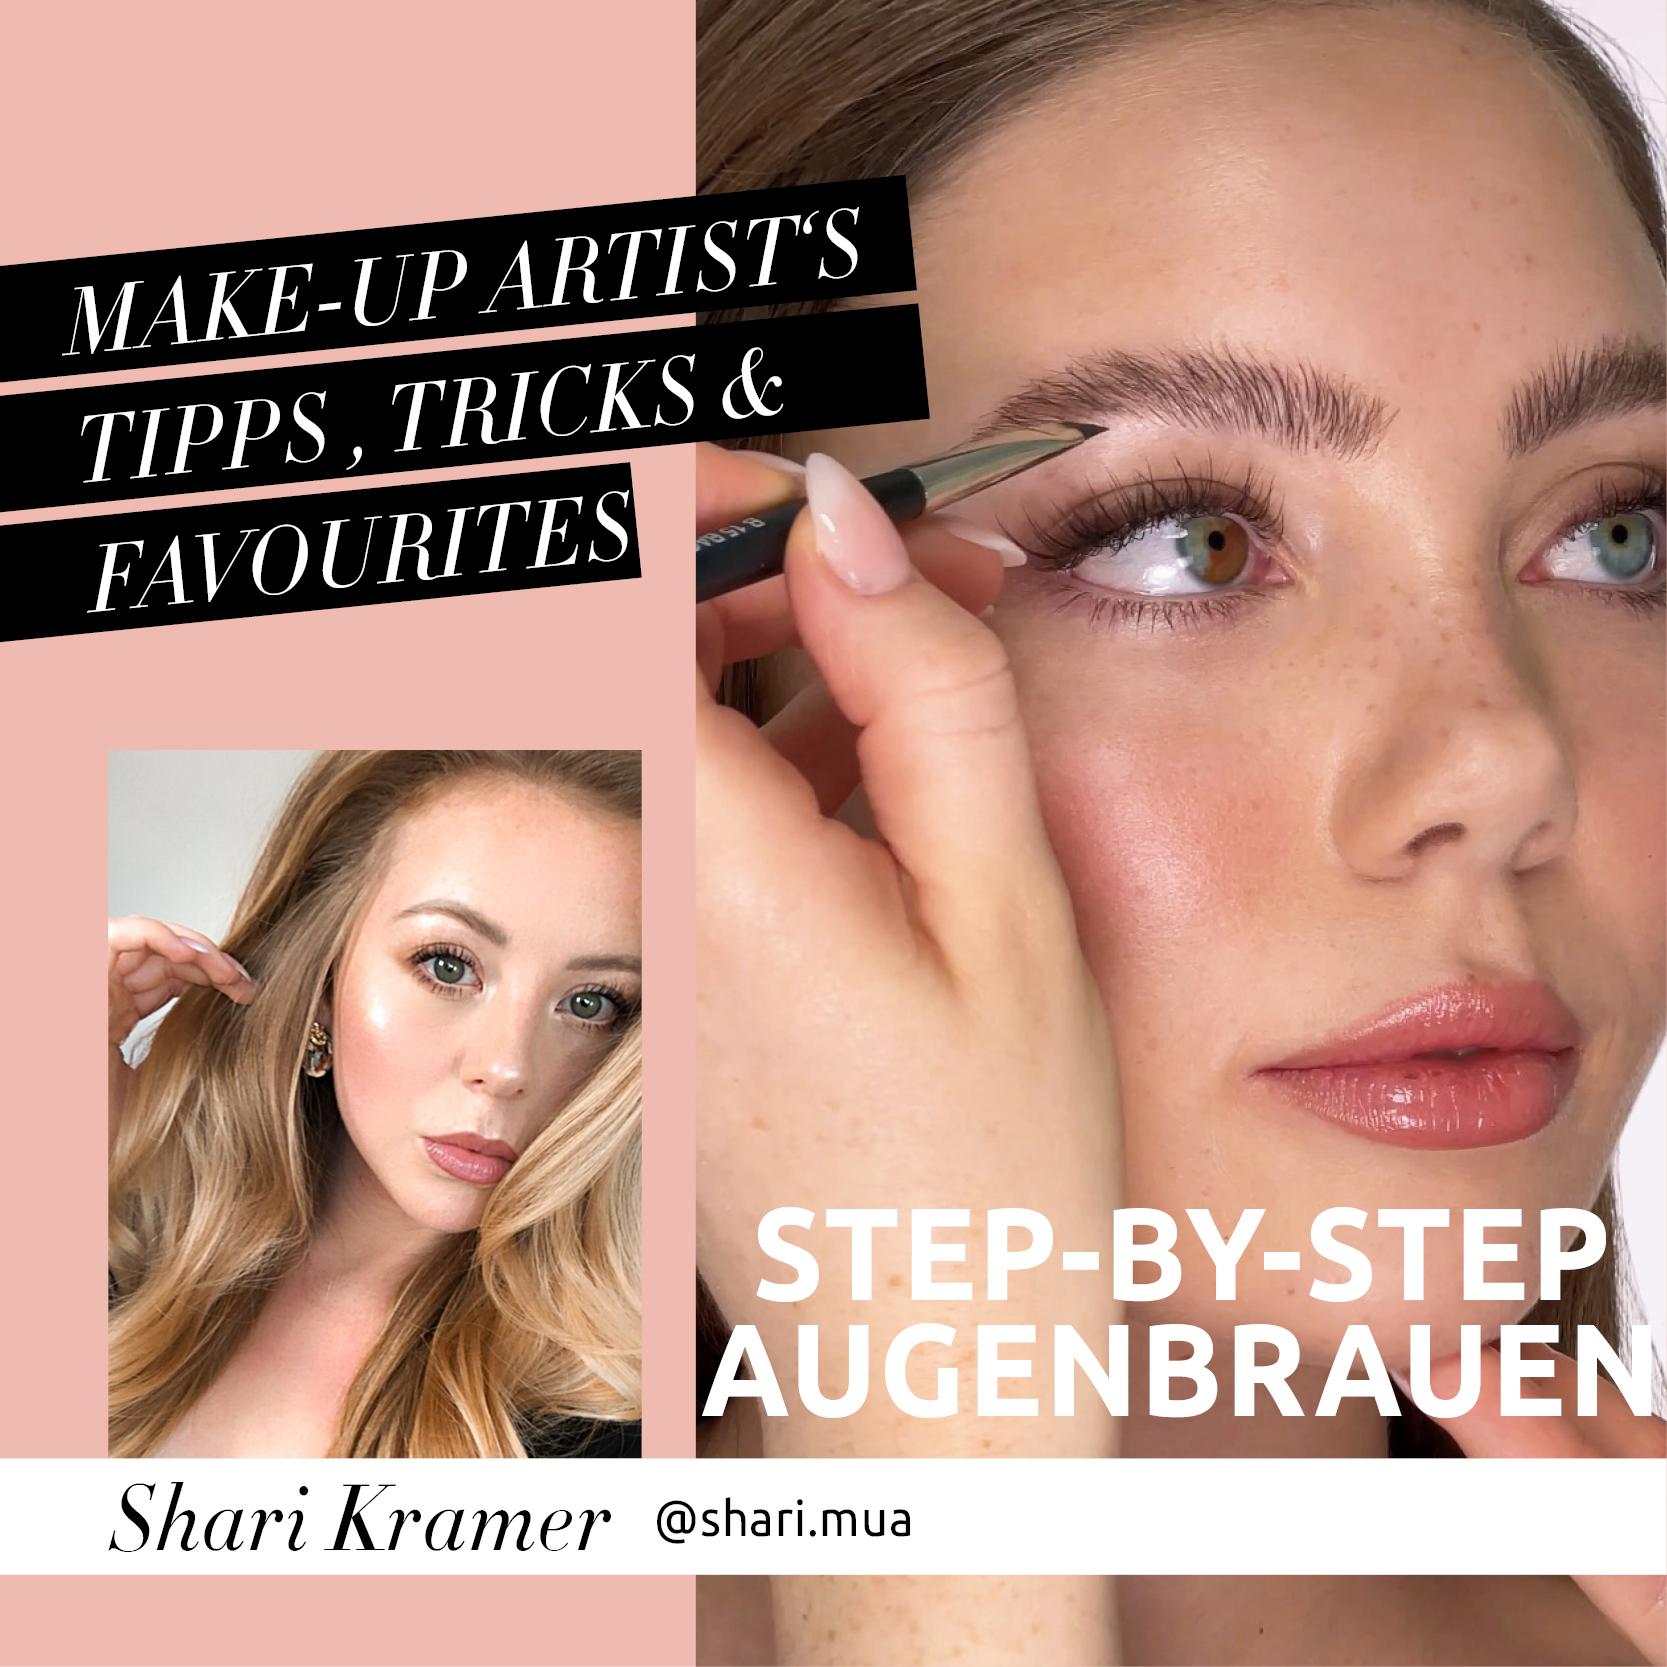 Shari.mua's perfekte Augenbrauen - Tutorial